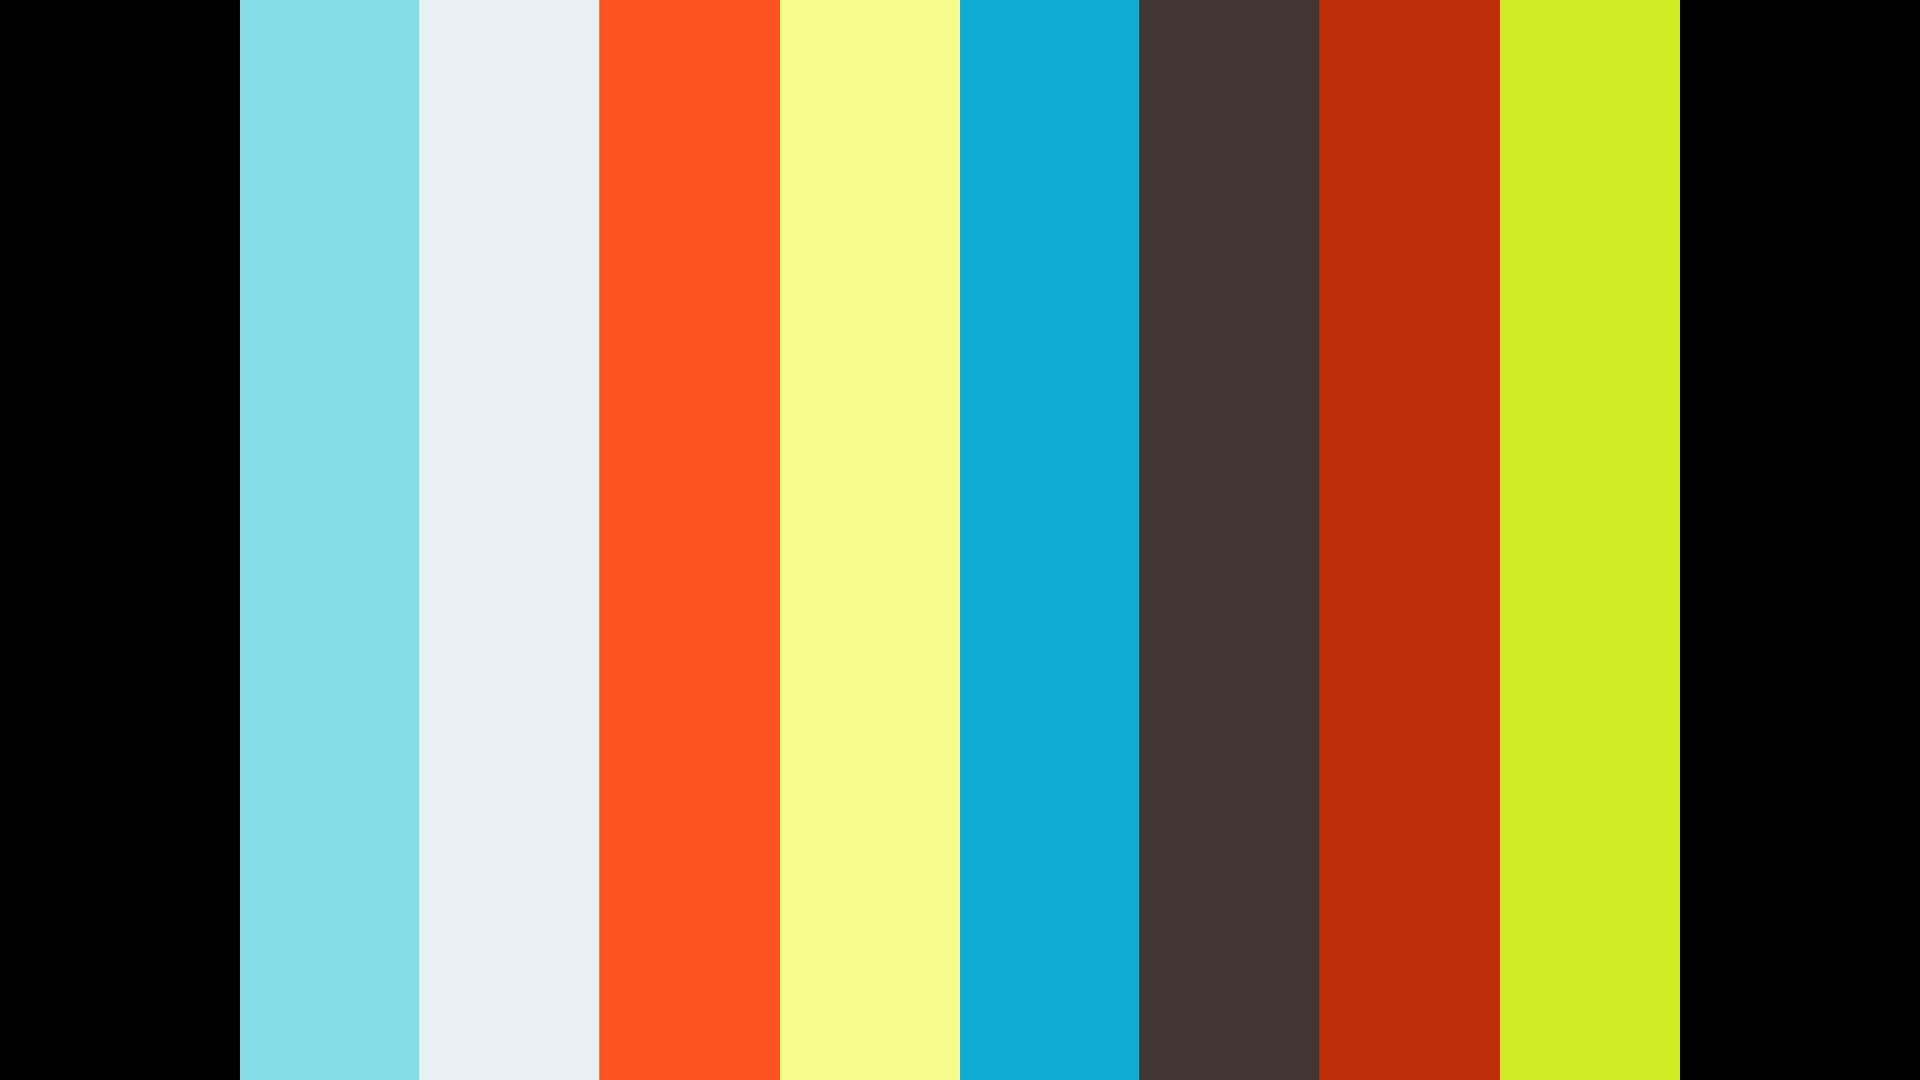 https://www.tvmodum.no/wp-content/uploads/2021/08/2021-08-31_MasseyFergusonExperienceiModum.jpg